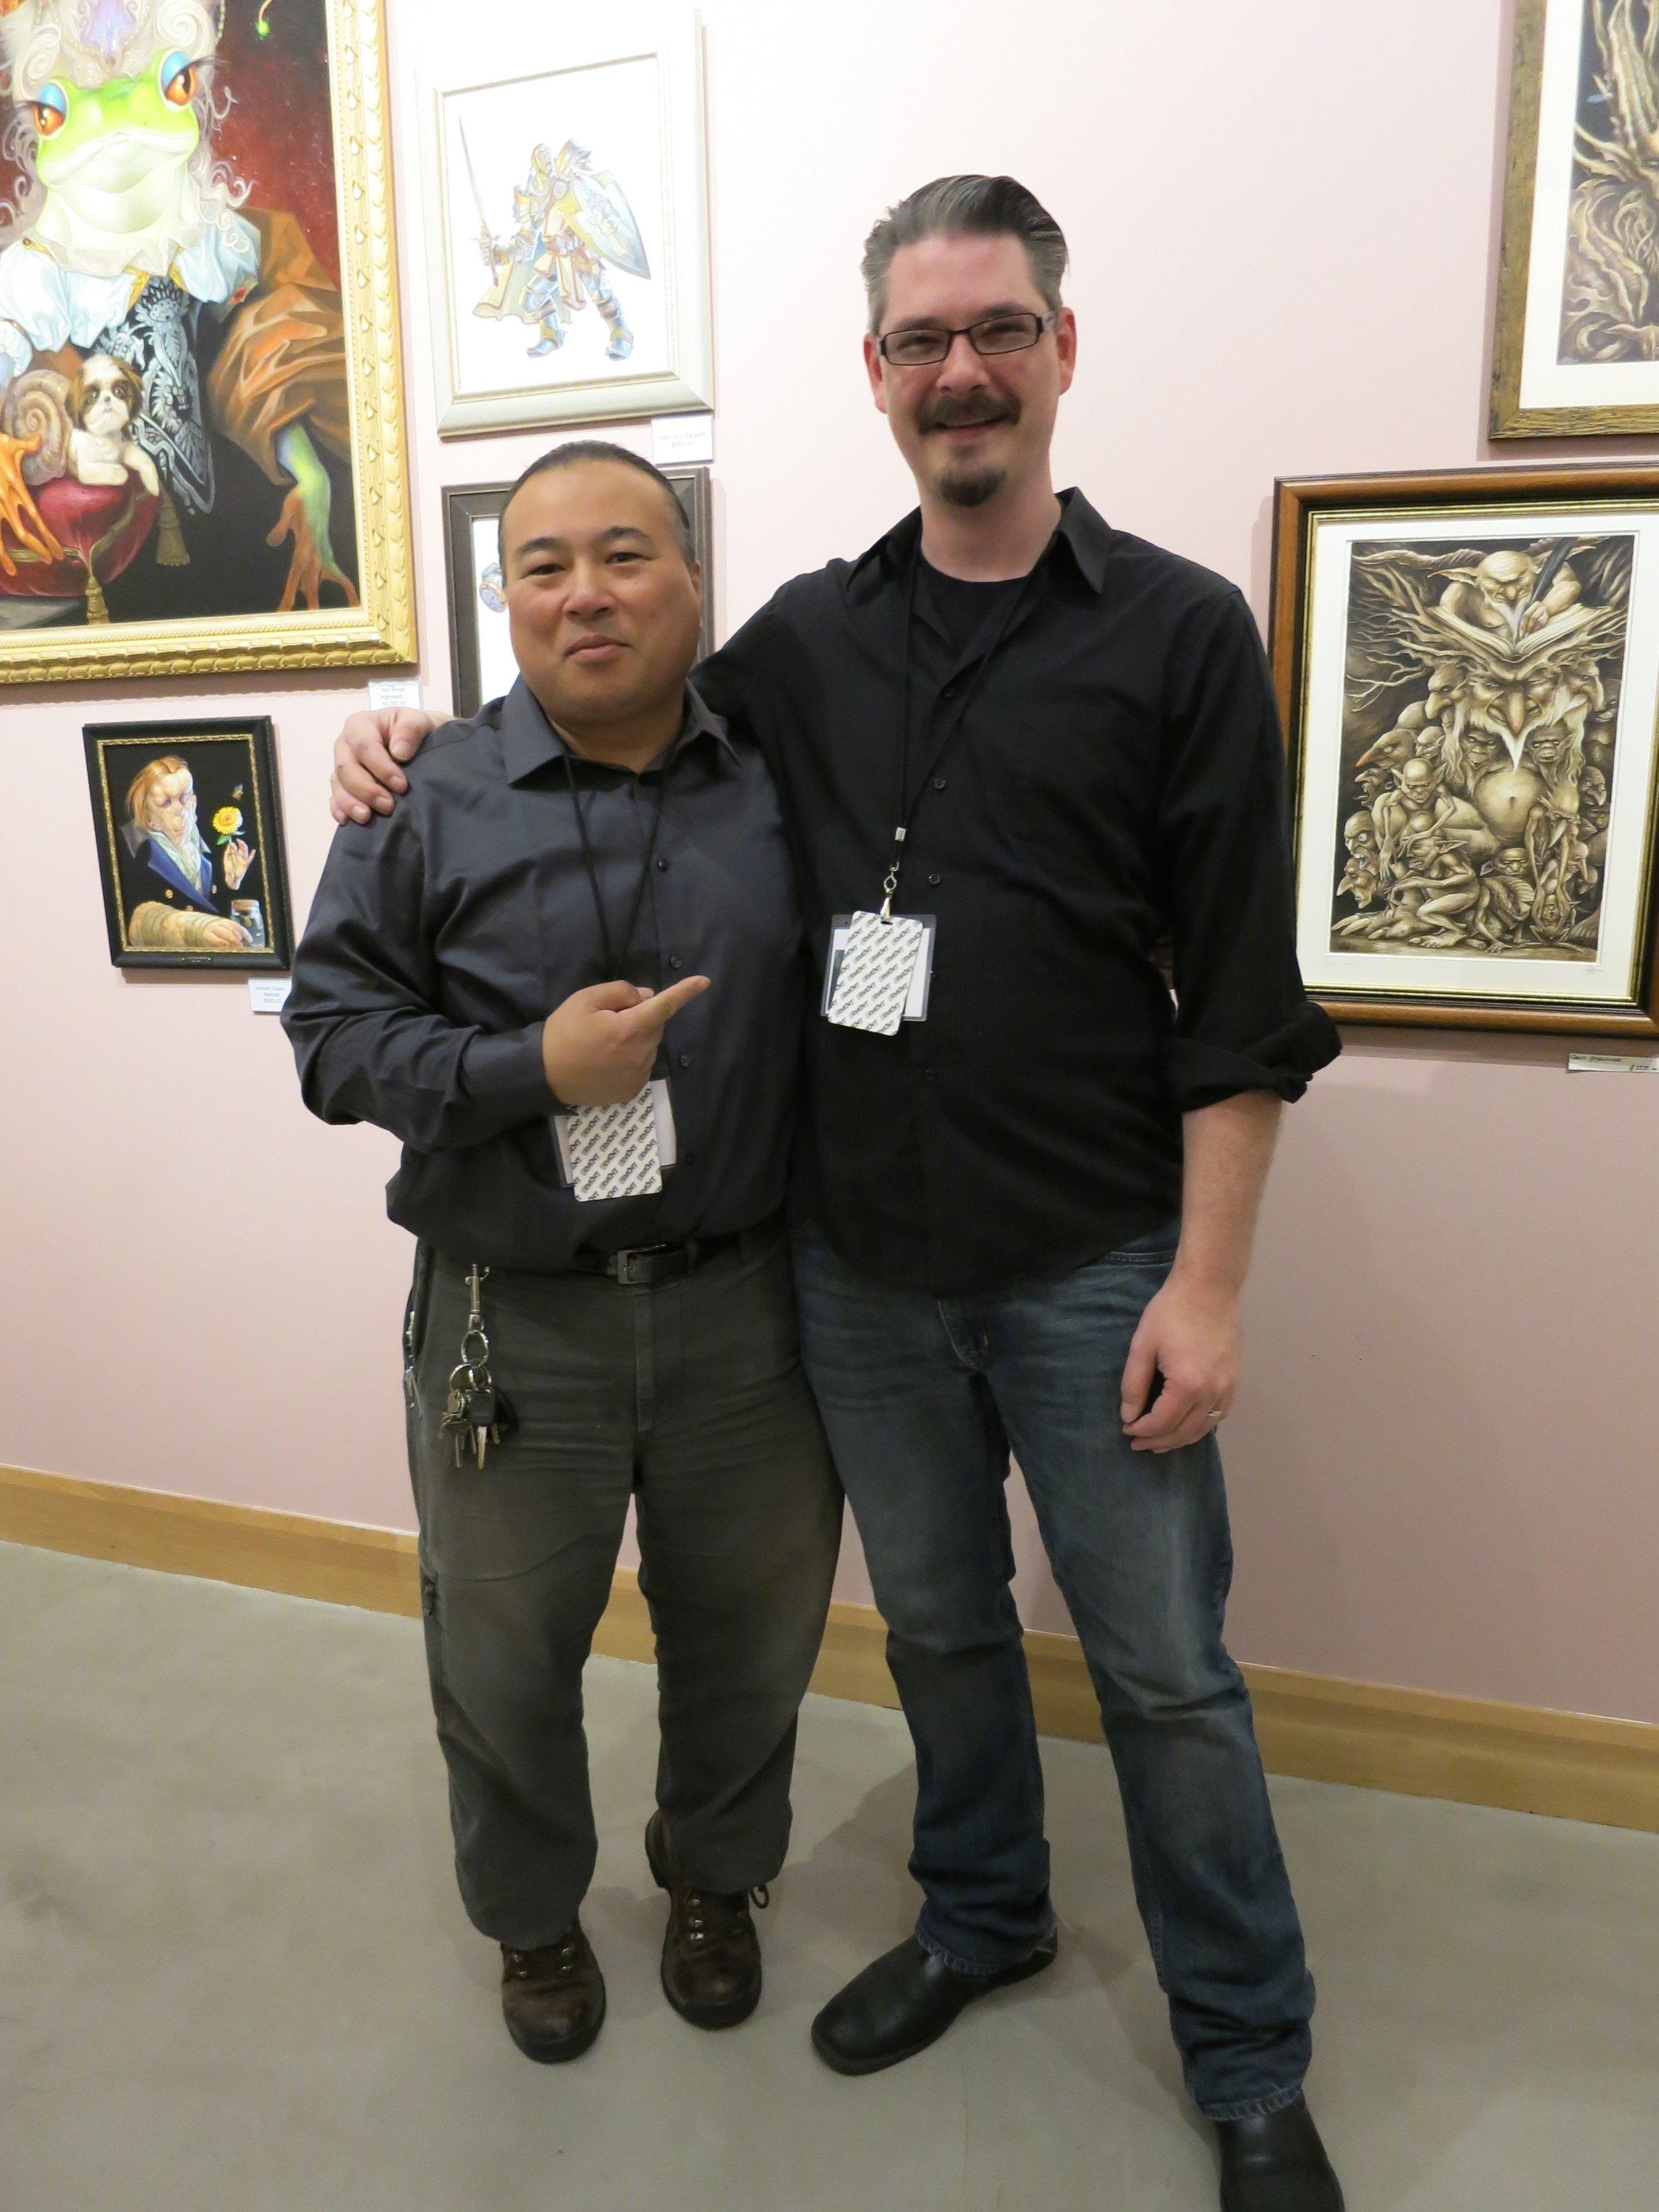 Myself with the amazing artist Travis Louie